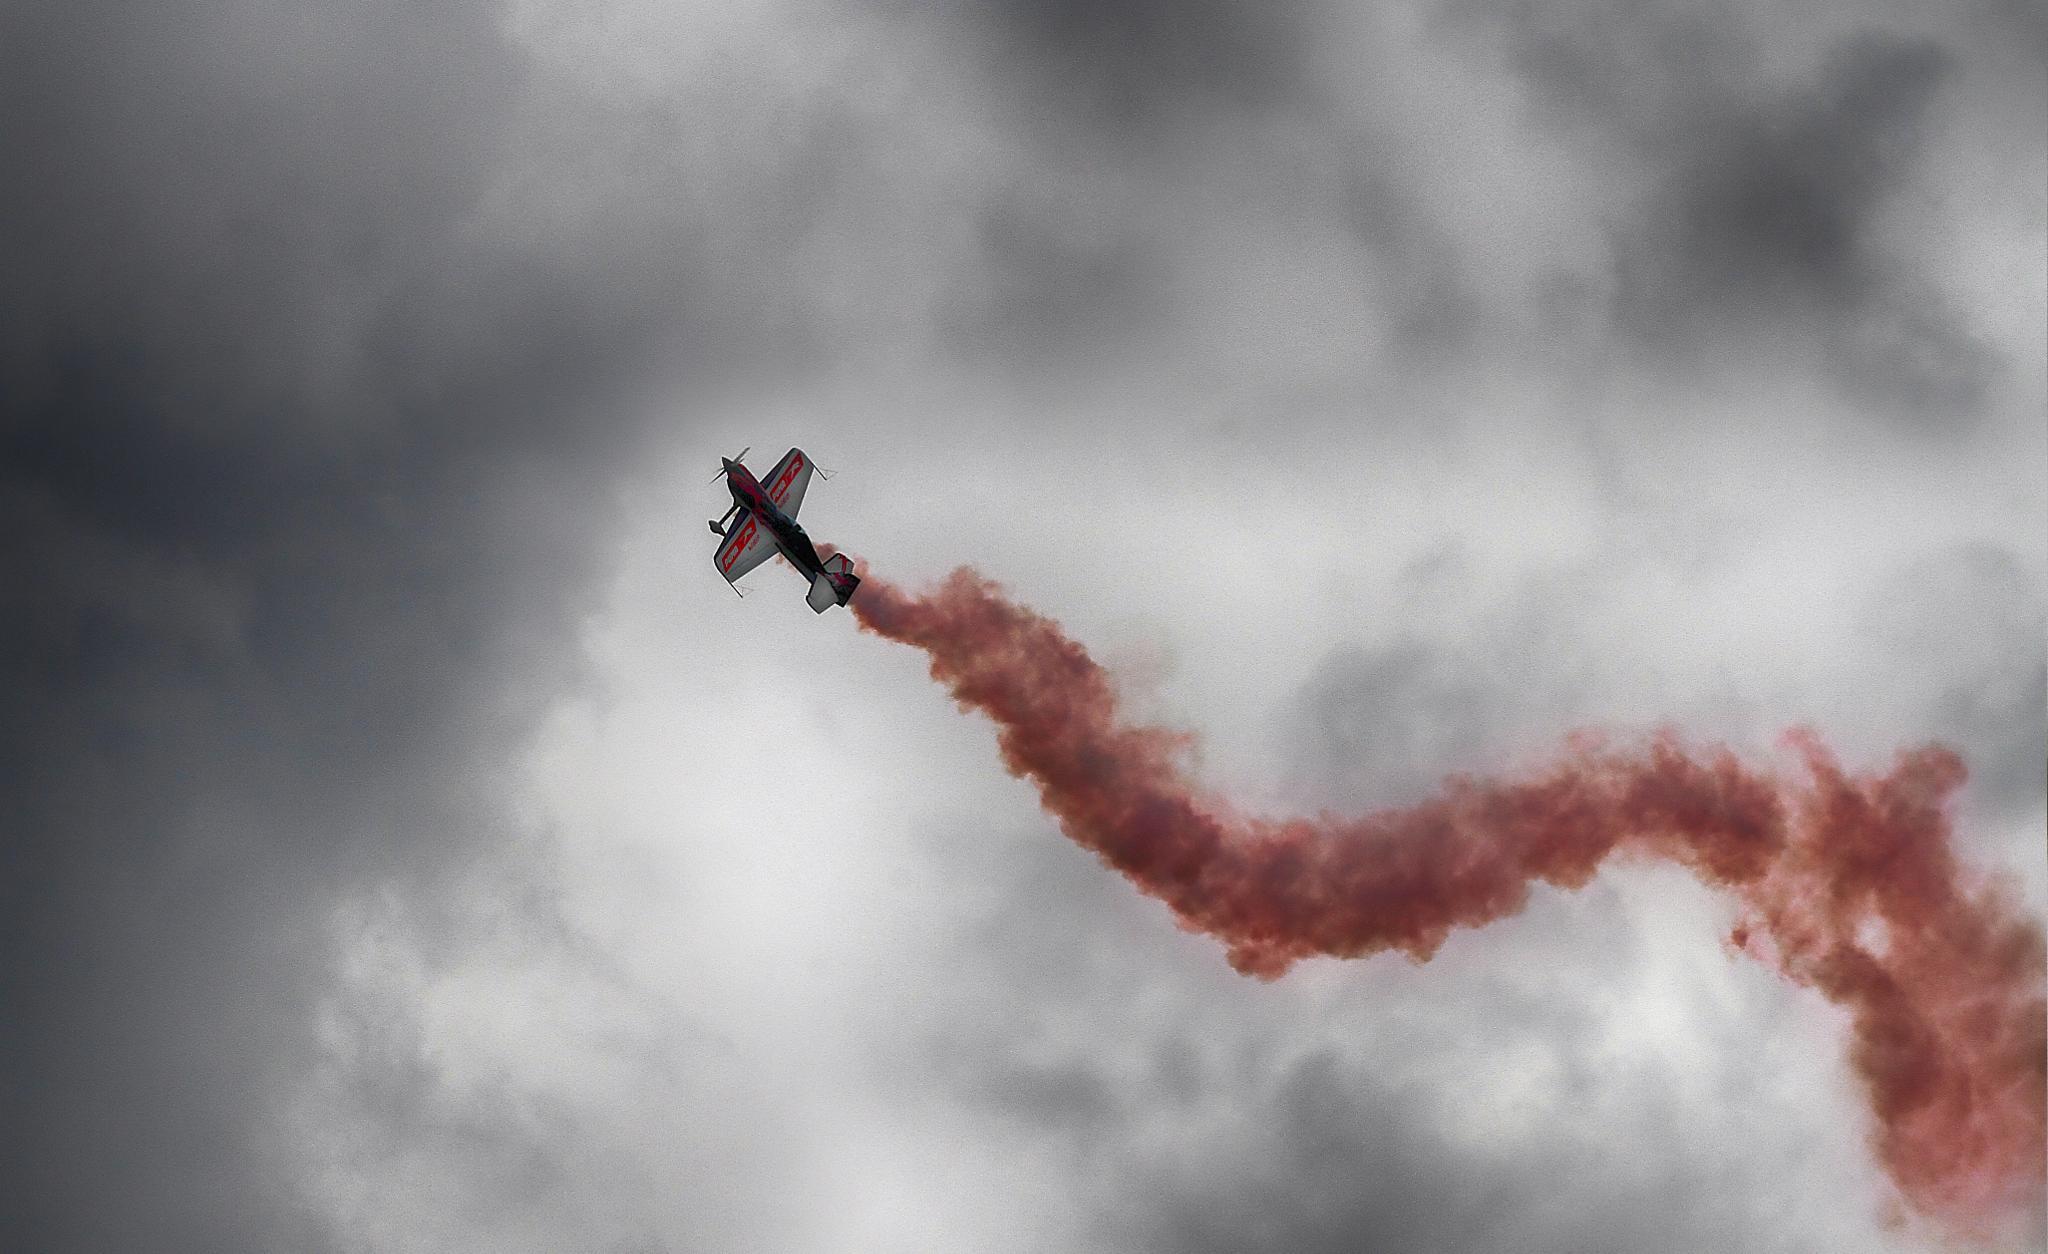 Sunderland Airshow by Nigel S Jones